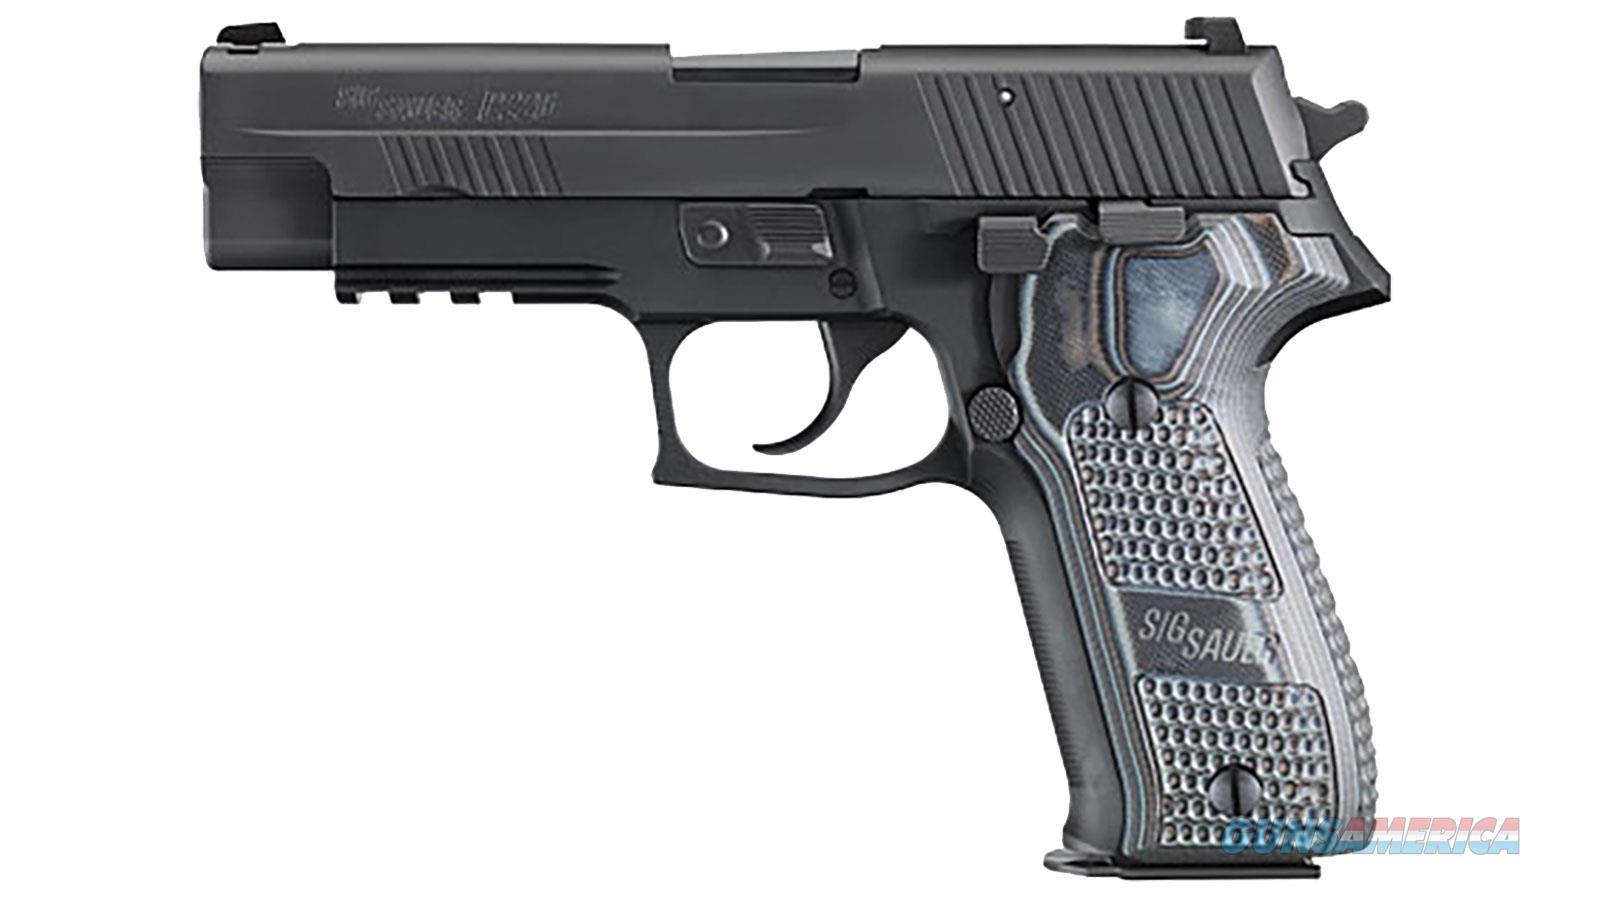 "Sig Sauer P226 9Mm 4.4"" 10Rd 226R-9-XTM-BLKGRY-CA  Guns > Pistols > S Misc Pistols"